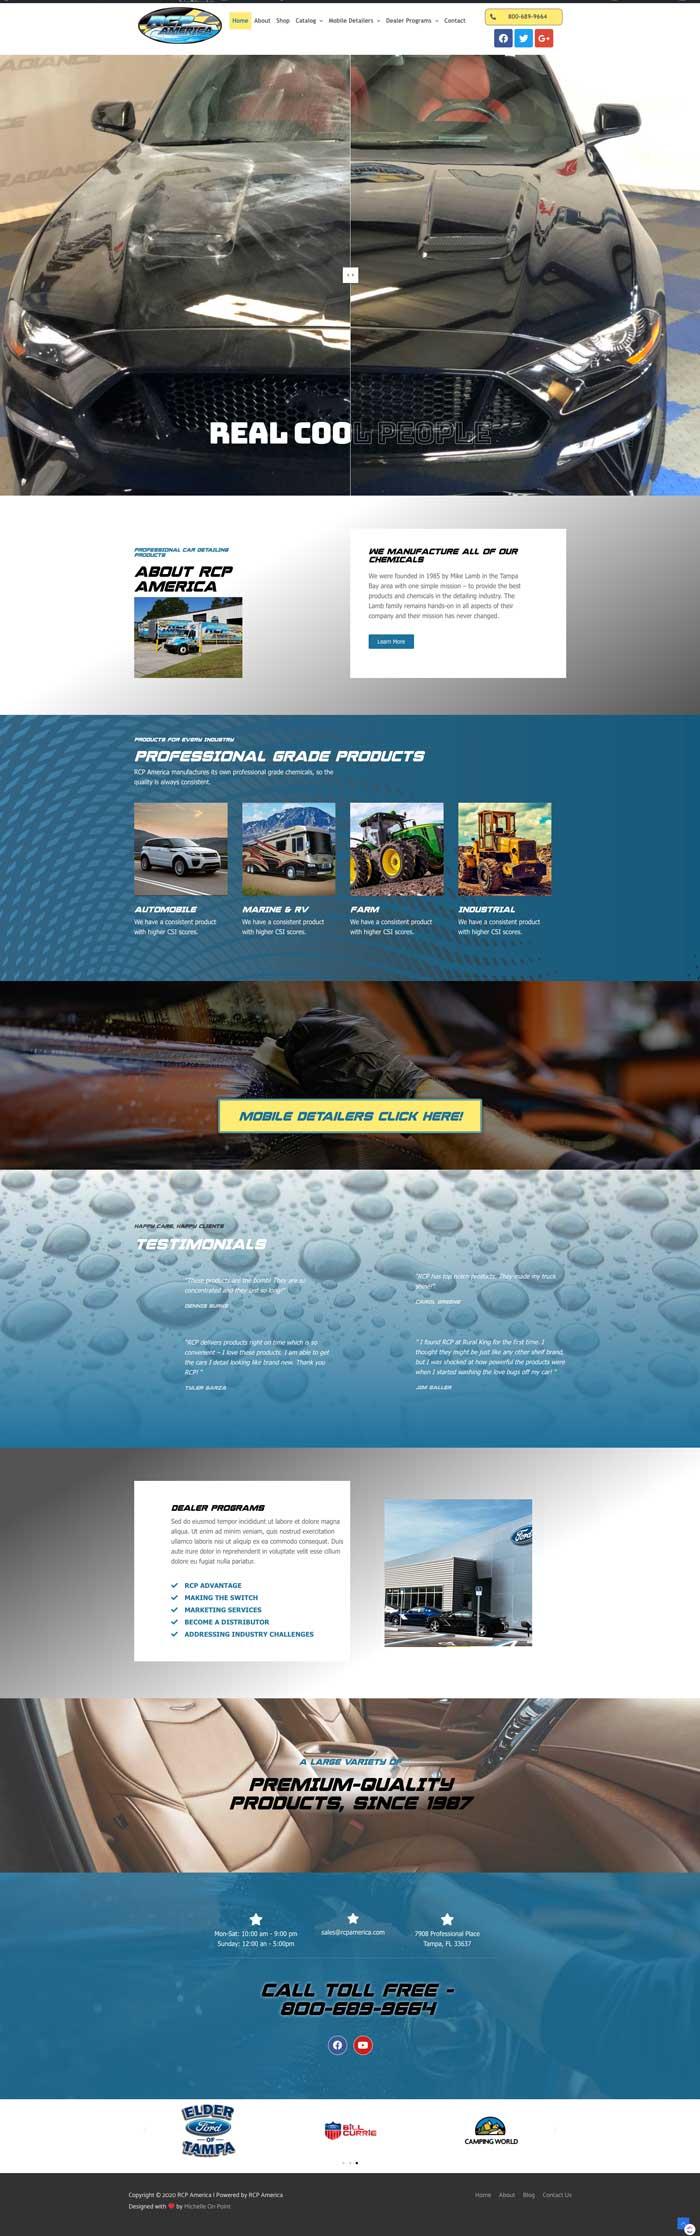 RCP America Website